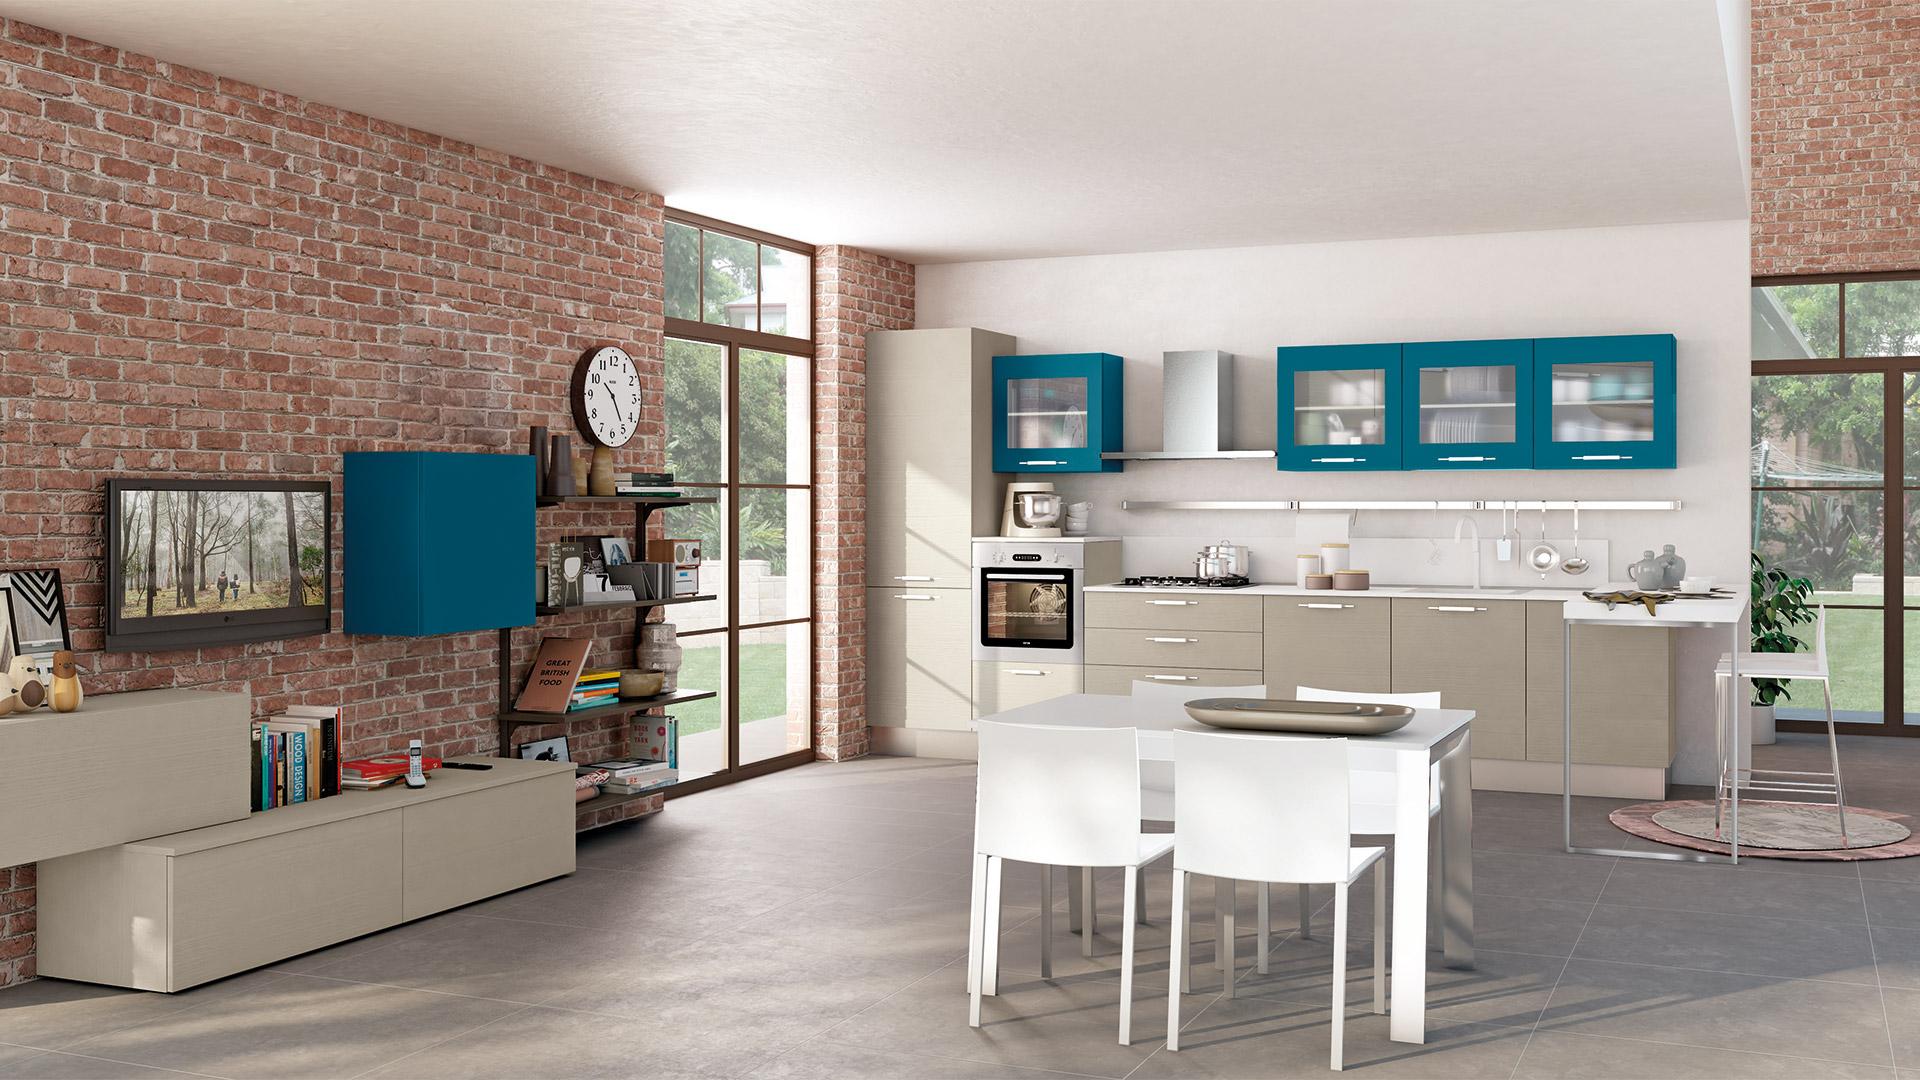 Cucina moderna lube kyra creo kitchens - Cucina lube kyra ...